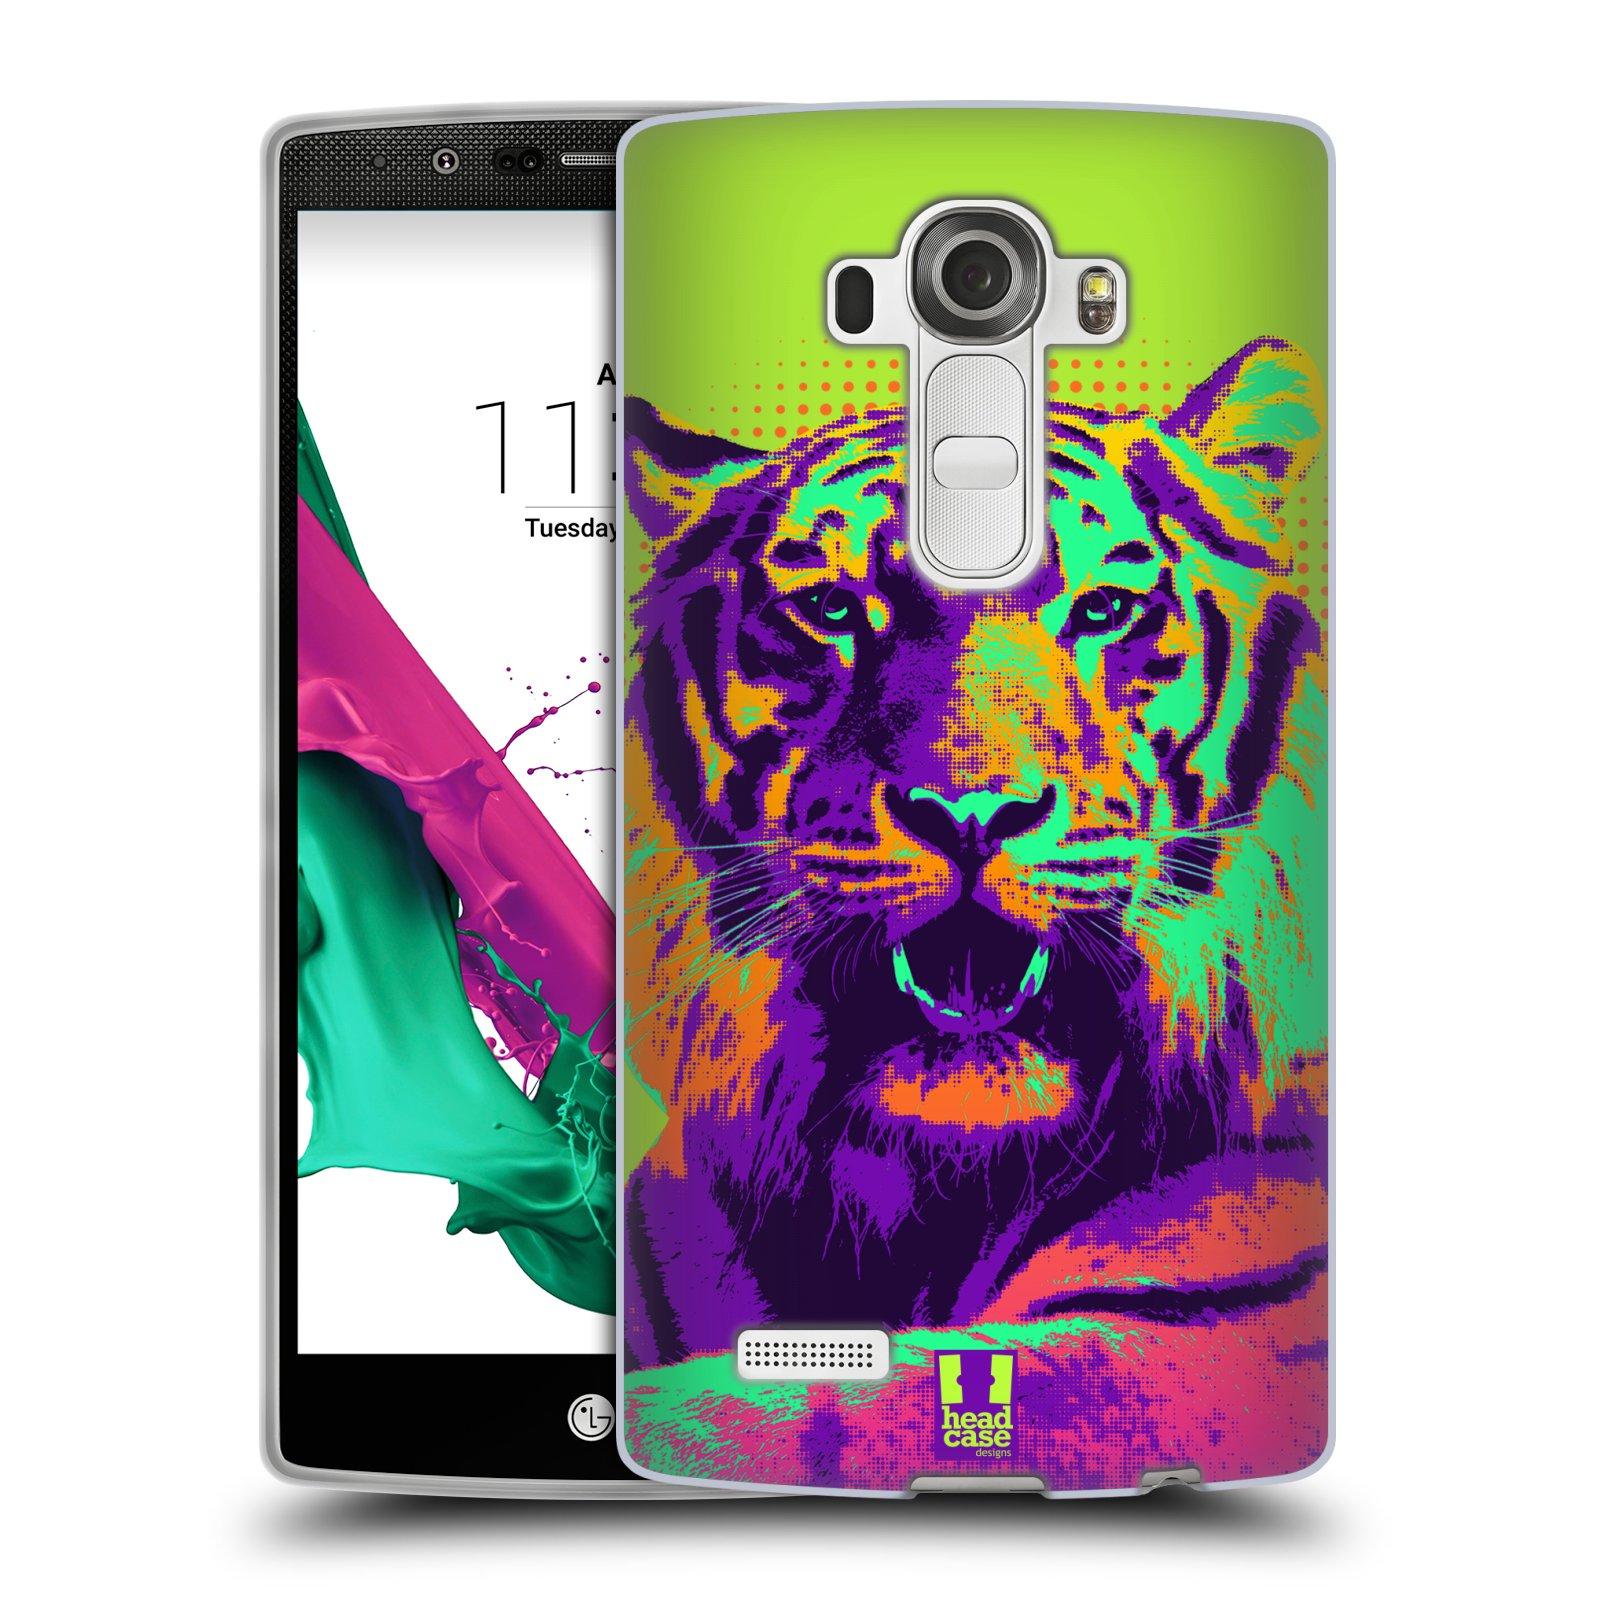 Silikonové pouzdro na mobil LG G4 HEAD CASE POP PRINT TYGR (Silikonový kryt či obal na mobilní telefon LG G4 H815)